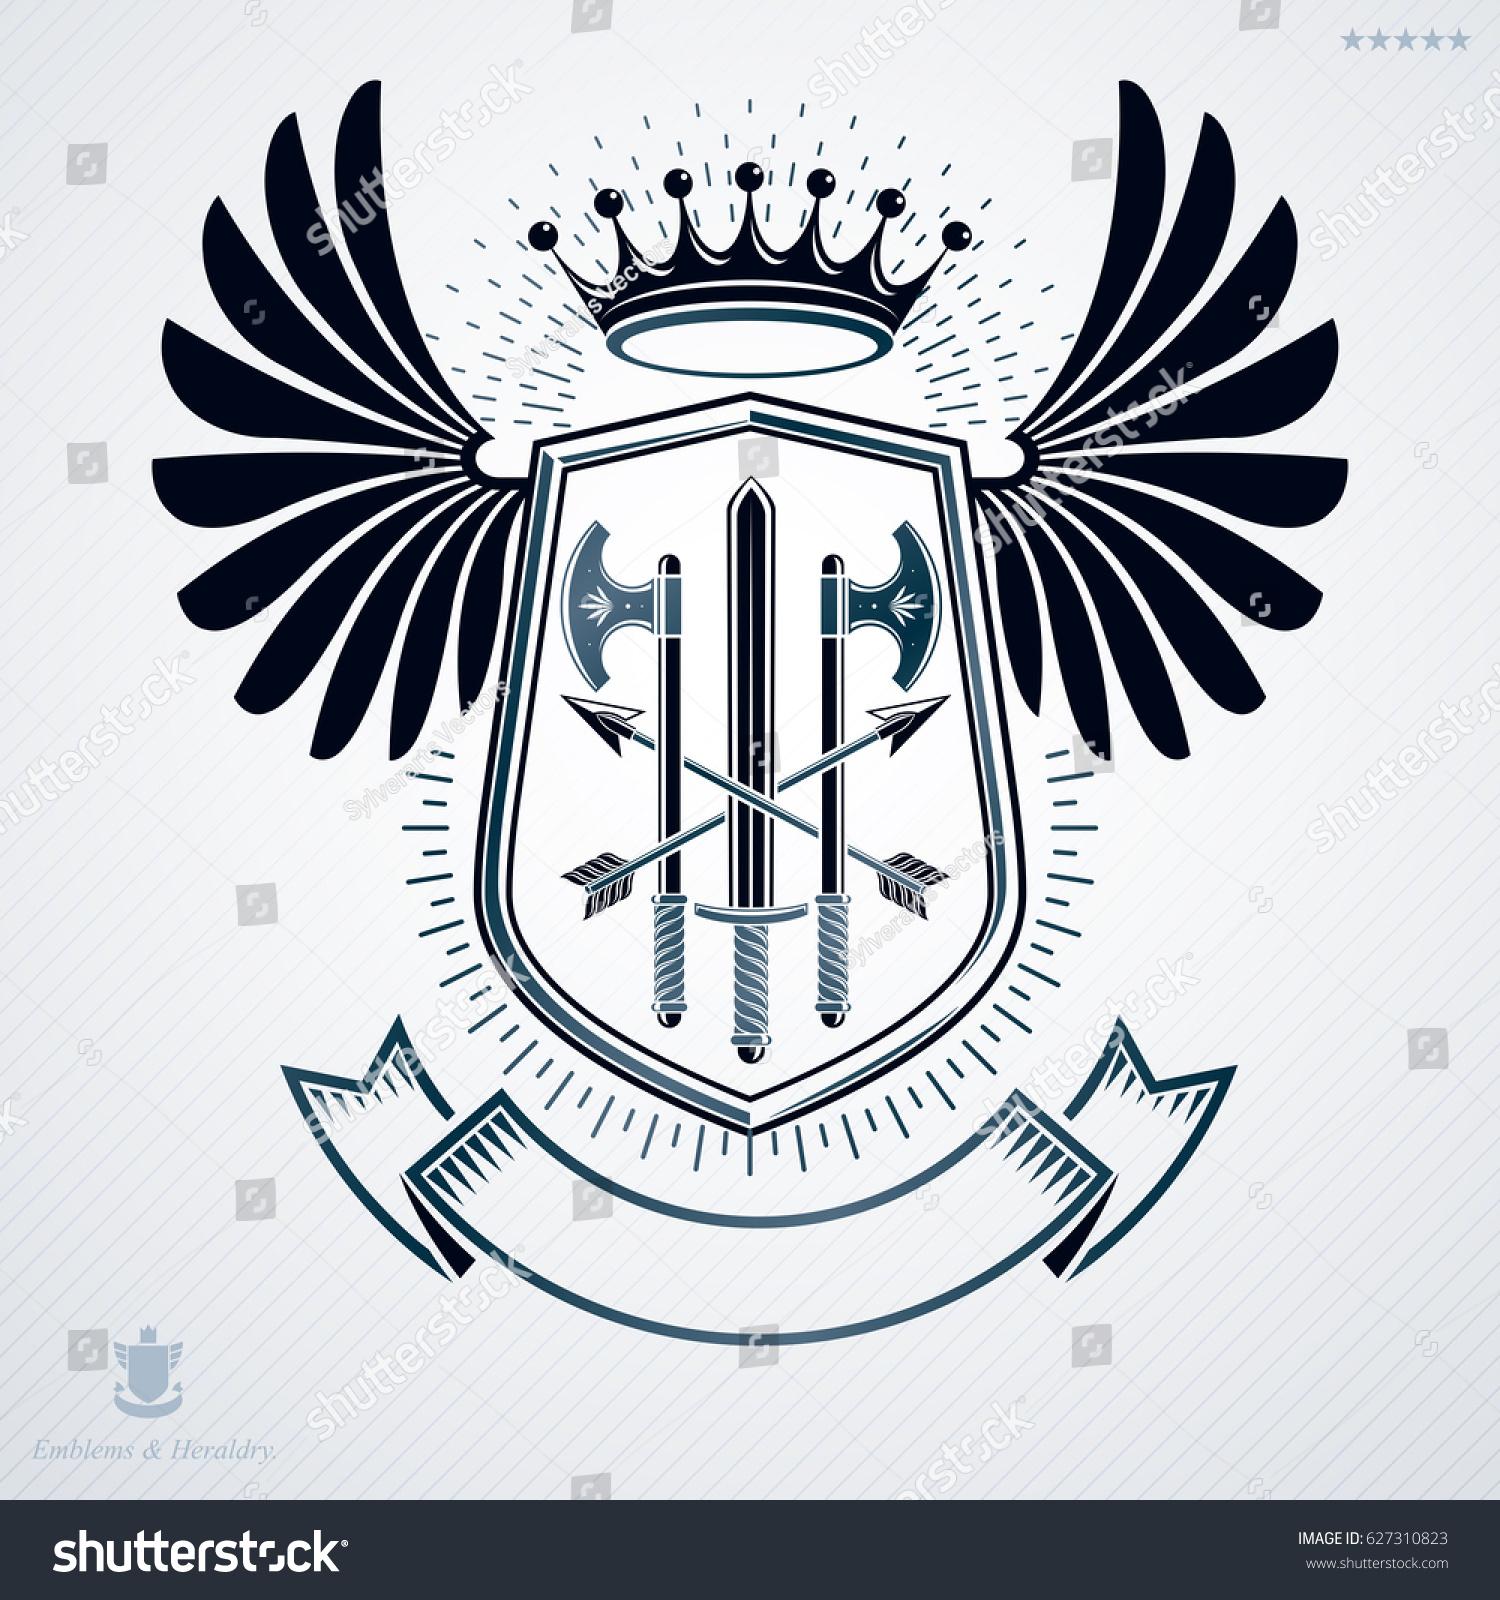 Heraldic coat arms decorative emblem symbolic stock illustration heraldic coat of arms decorative emblem symbolic illustration in vintsge style biocorpaavc Images